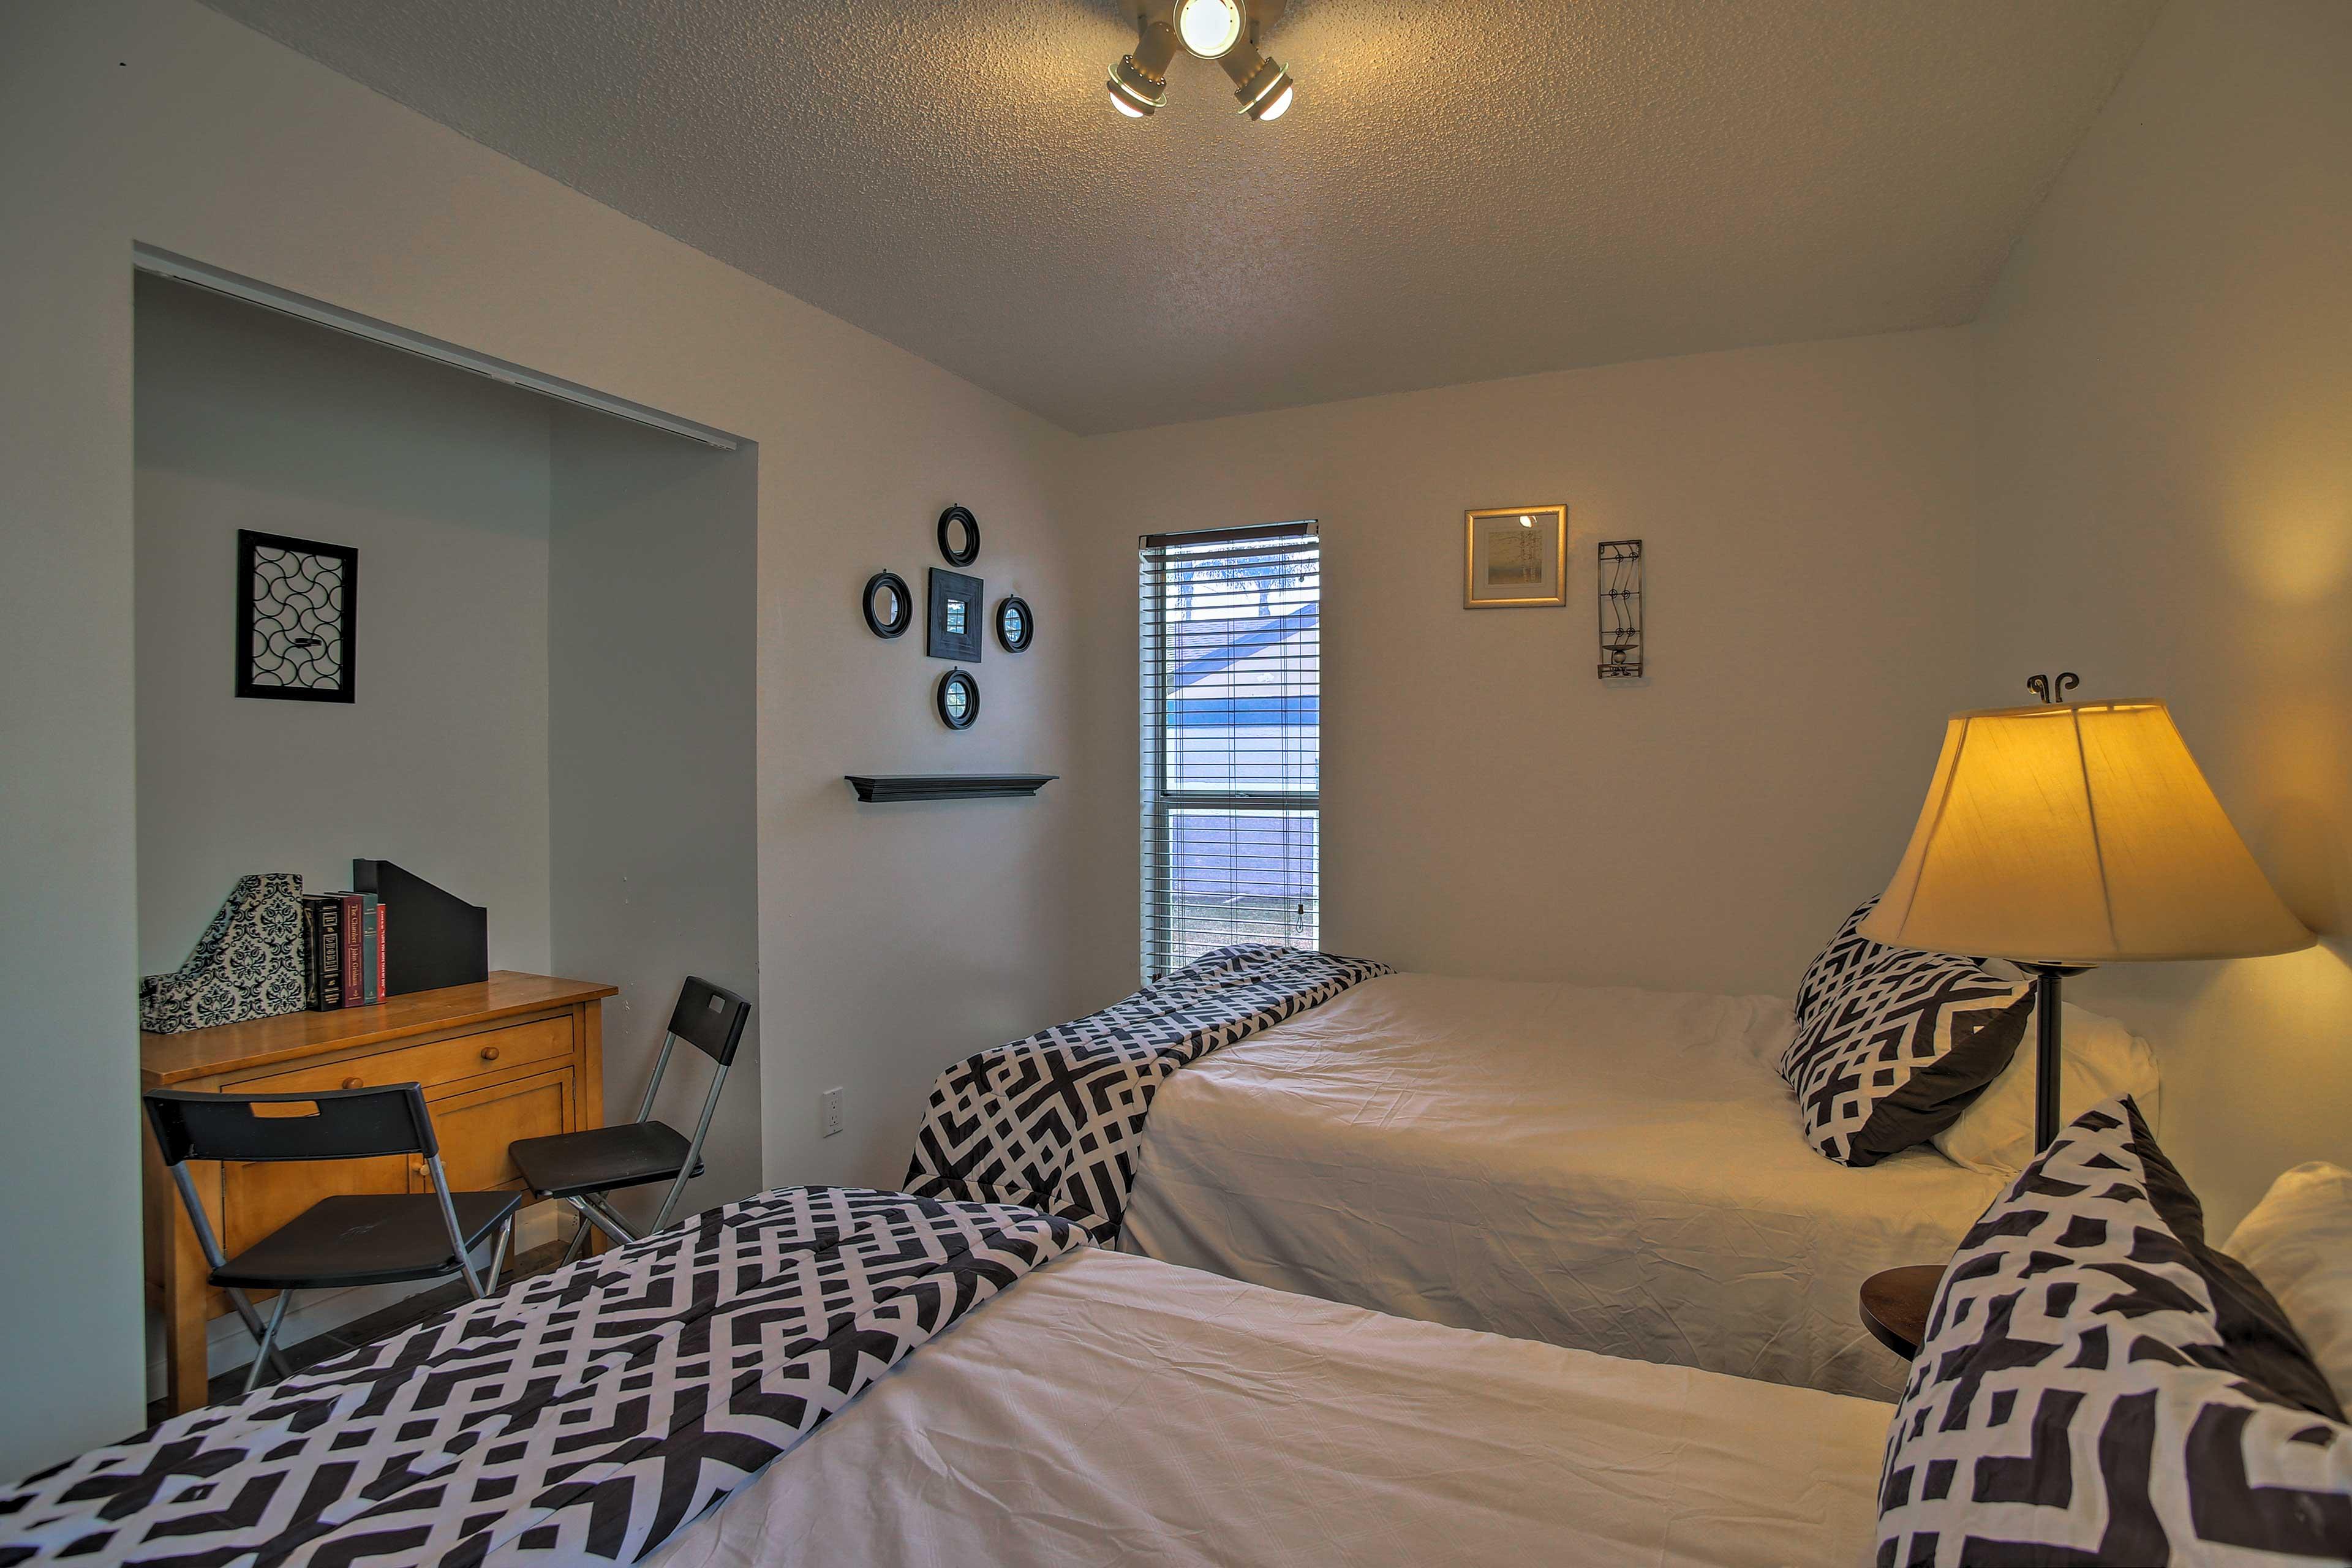 This cozy room sleeps 4 comfortably.